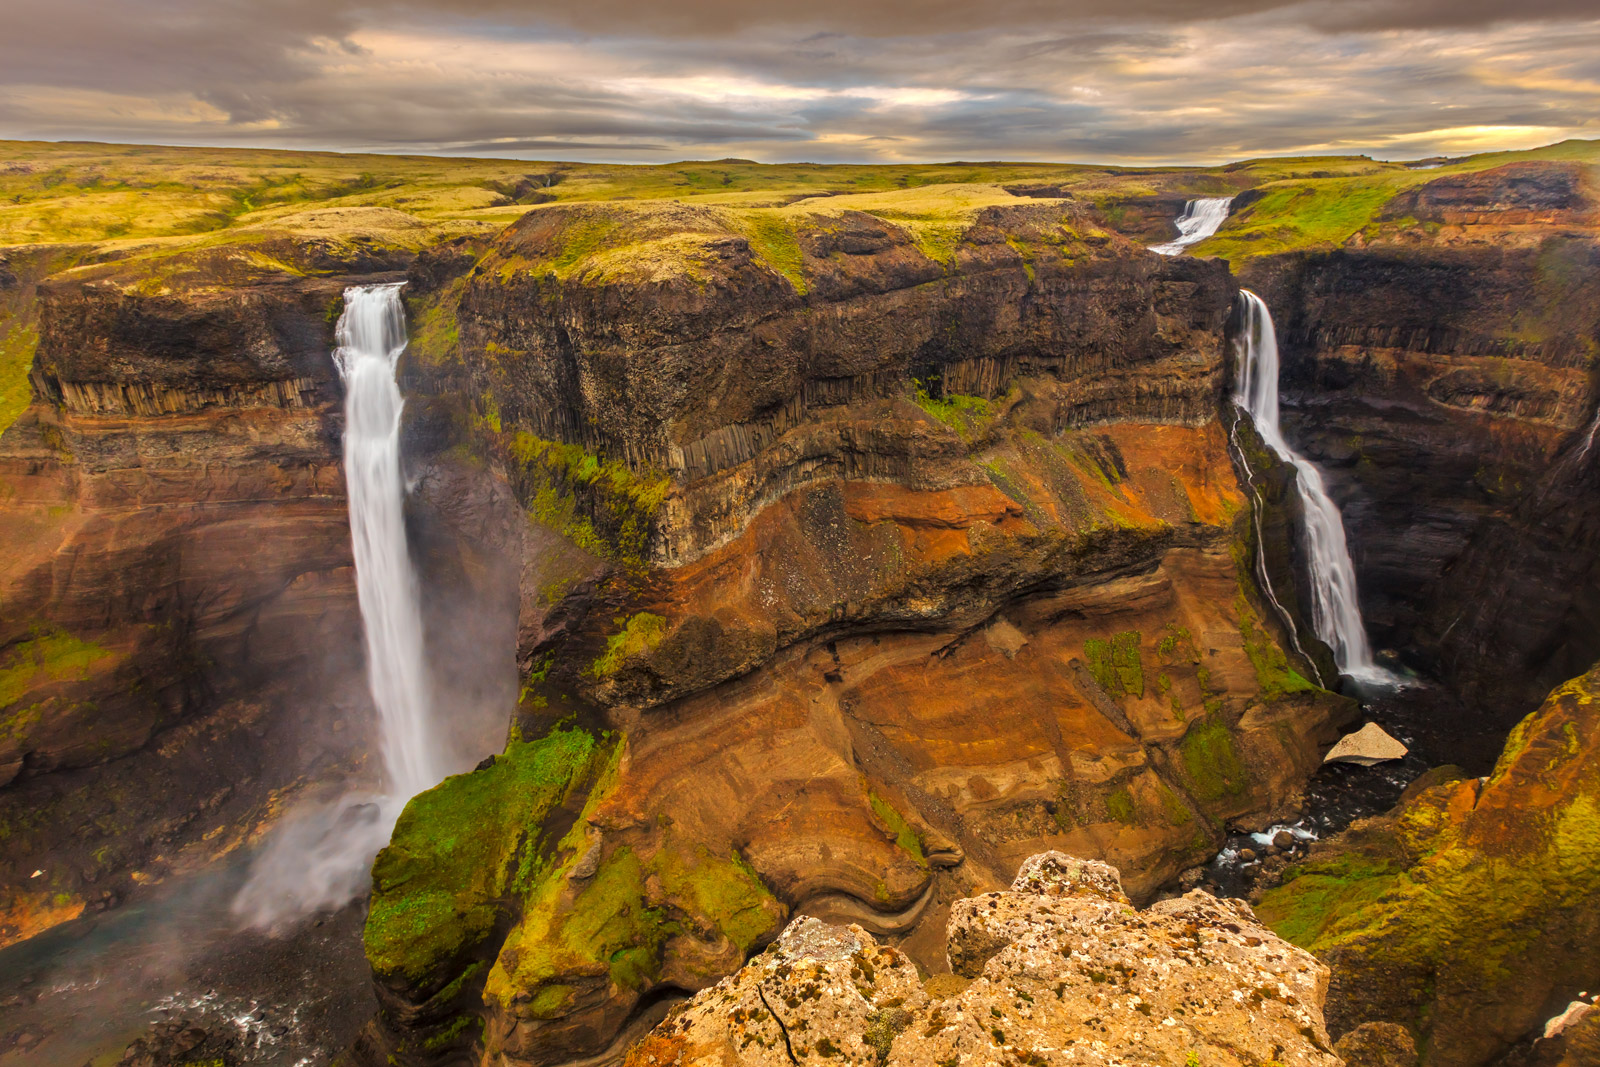 iceland, waterfall, haifoss, canyon, limited edition, photograph, fine art, landscape, photo